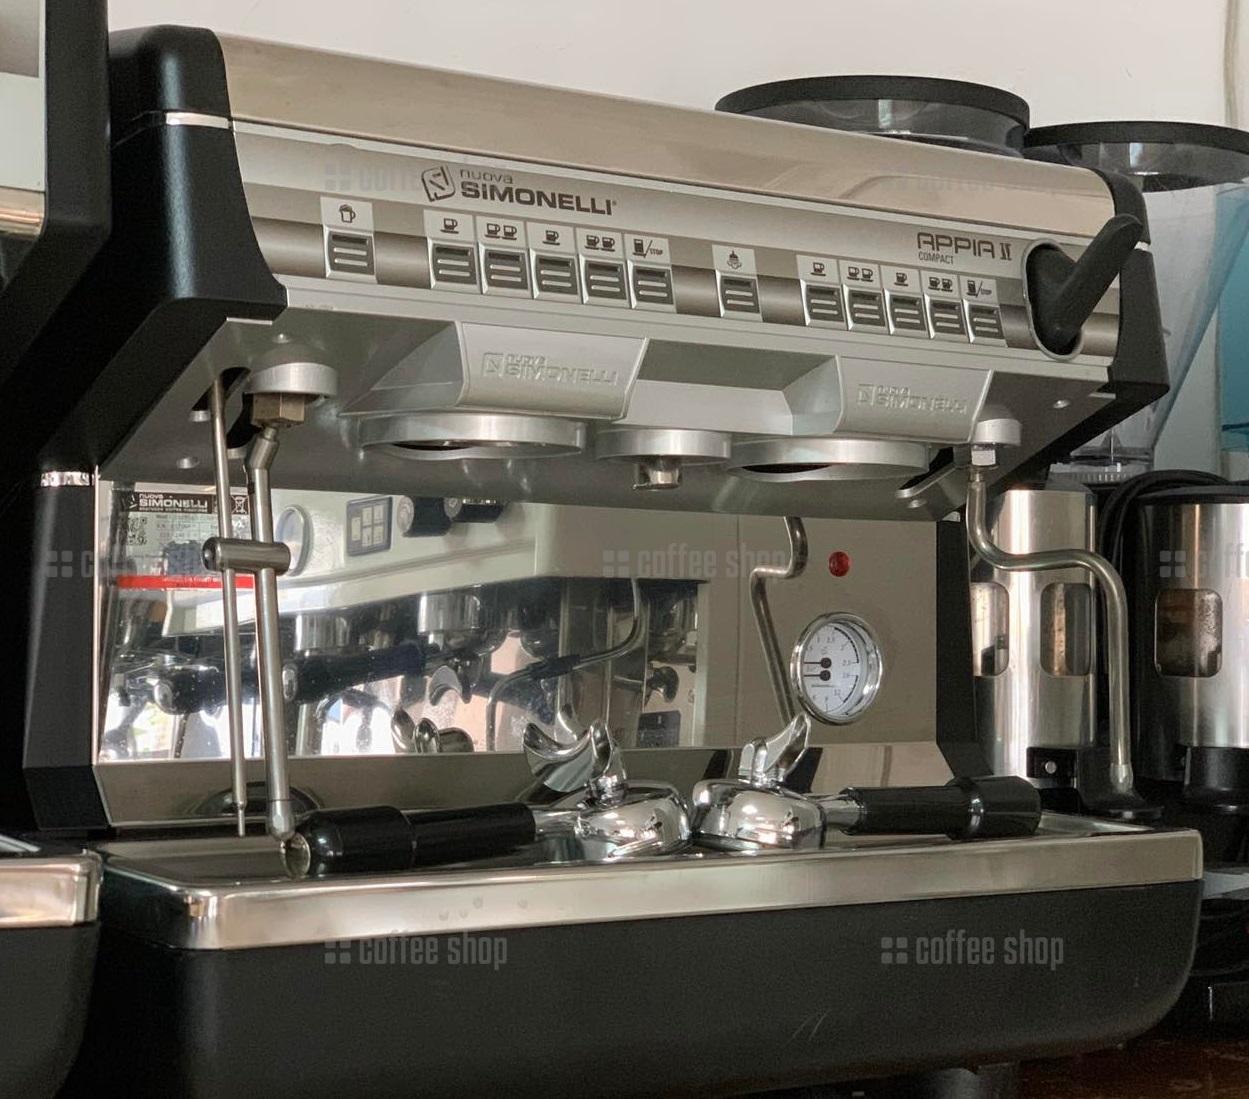 16461 | Кофемашина профессиональная Nuova Simonelli Appia Compact II V 2GR б/у | Coffee Shop